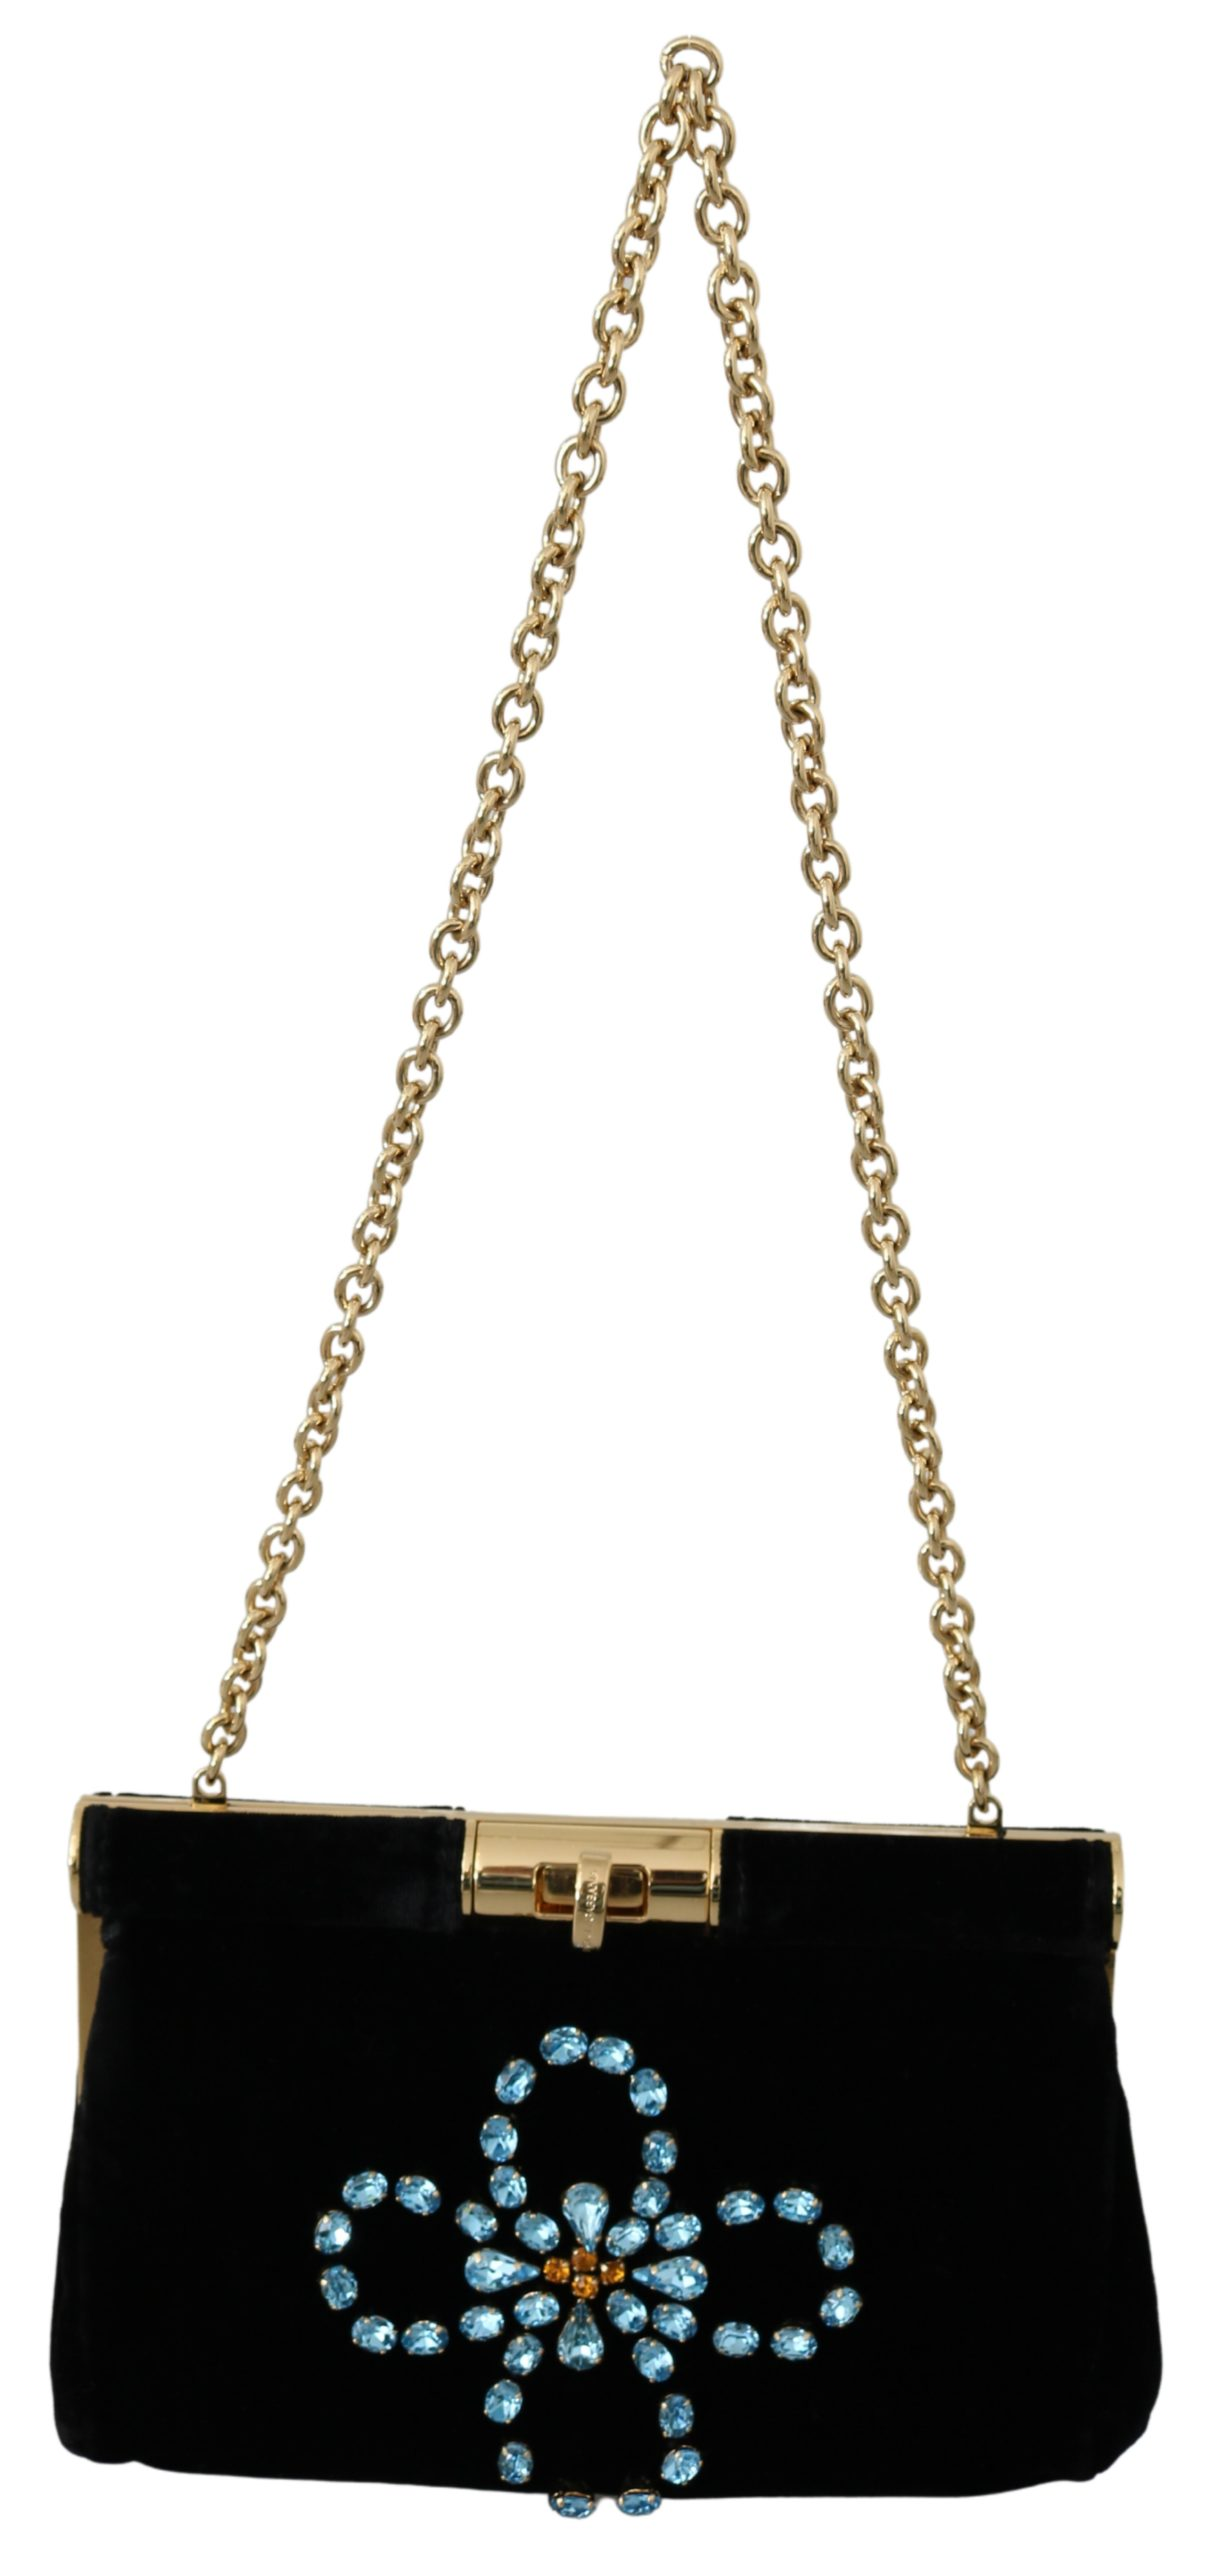 Dolce & Gabbana Women's Crystal Studs Crossbody Bag Black VAS9621